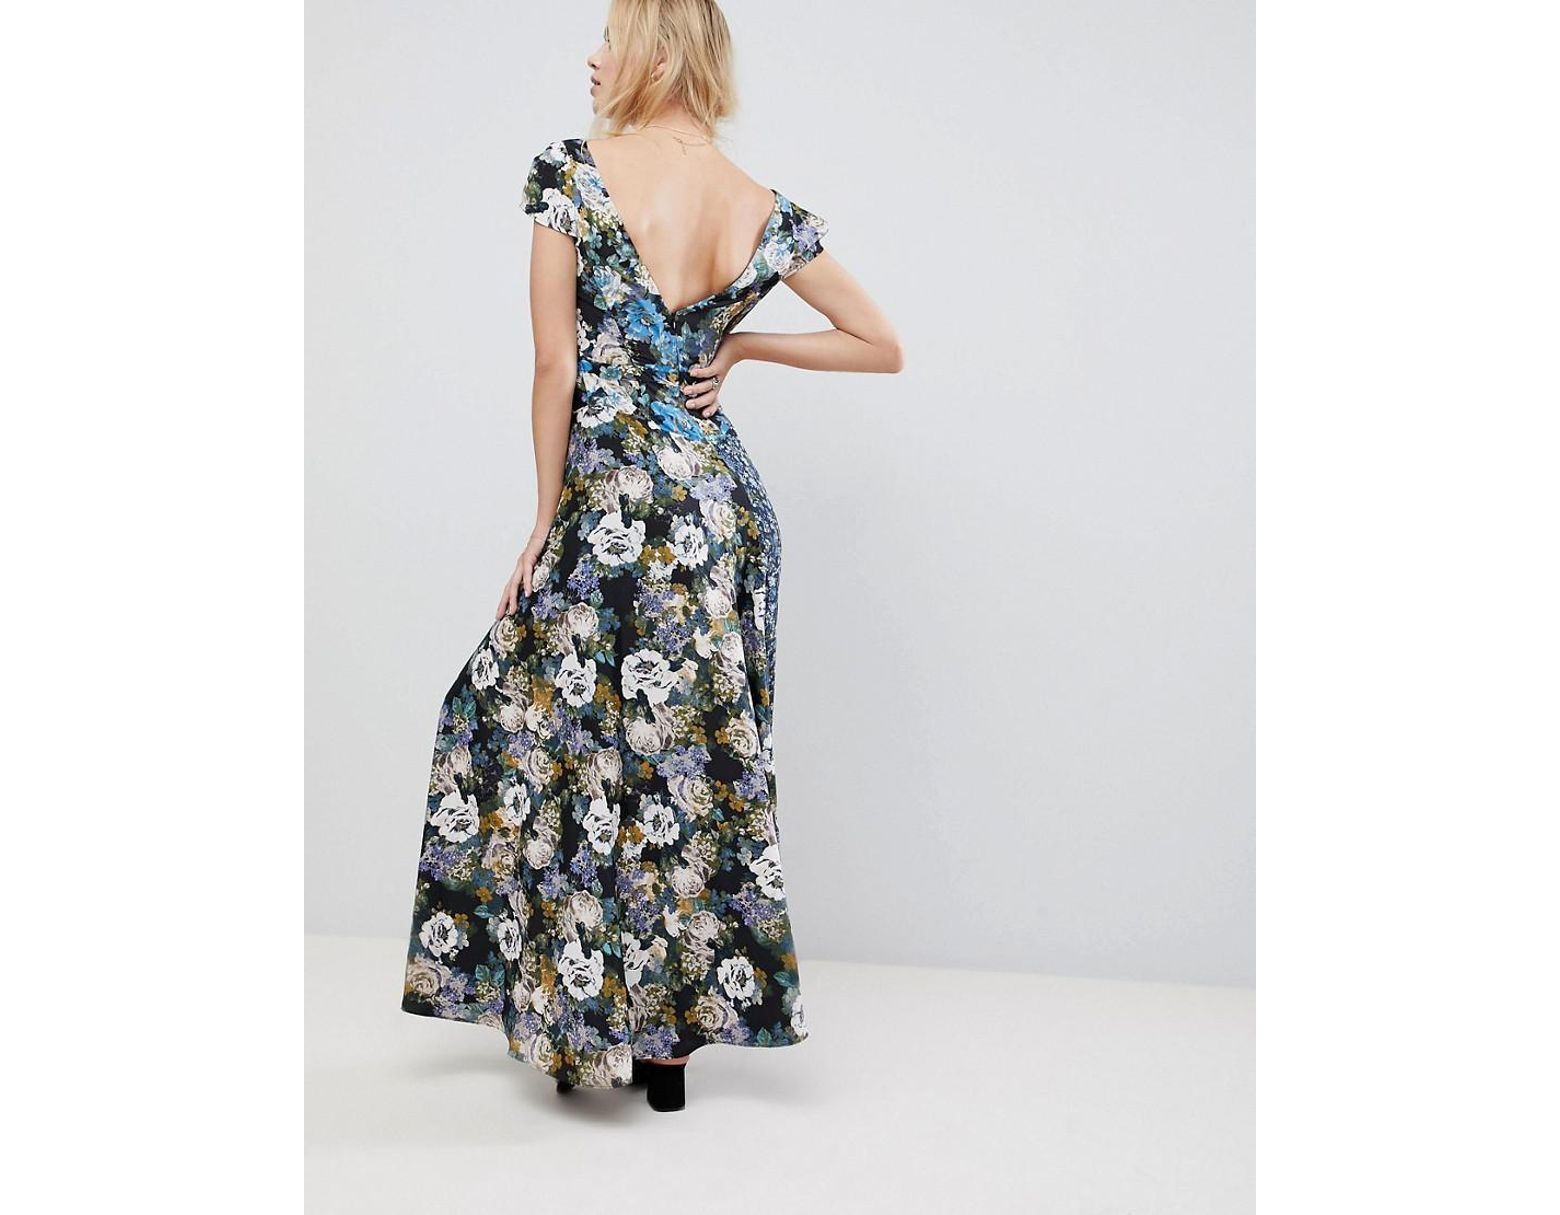 ae0f2655c4 Free People La Fleur Mixed Floral Print Maxi Dress in Blue - Save 66% - Lyst